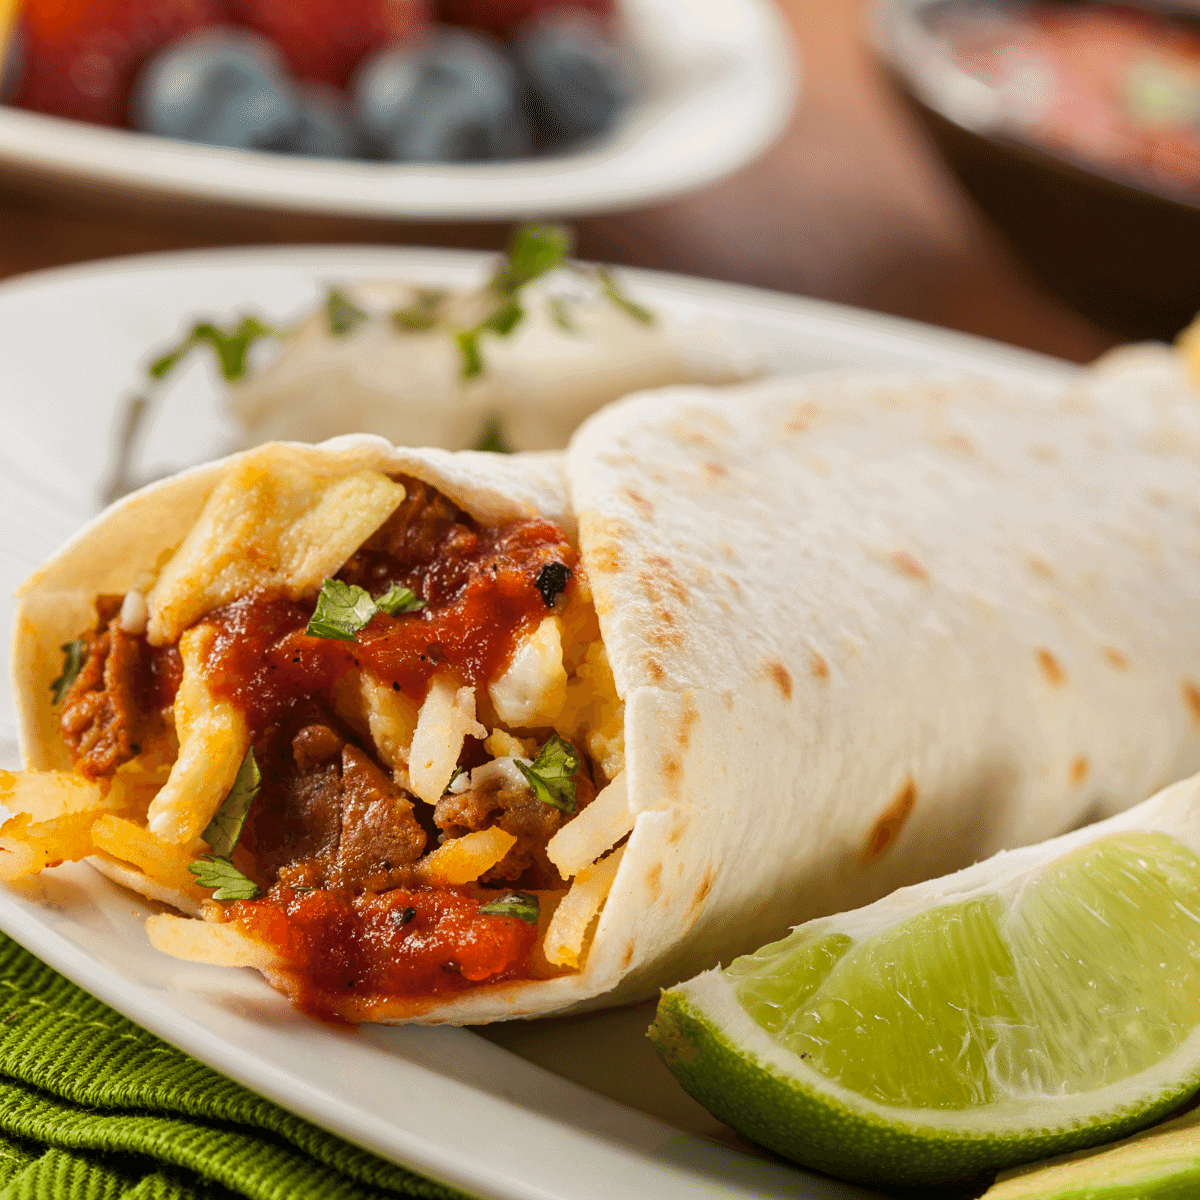 Low carb Breakfast Burritos